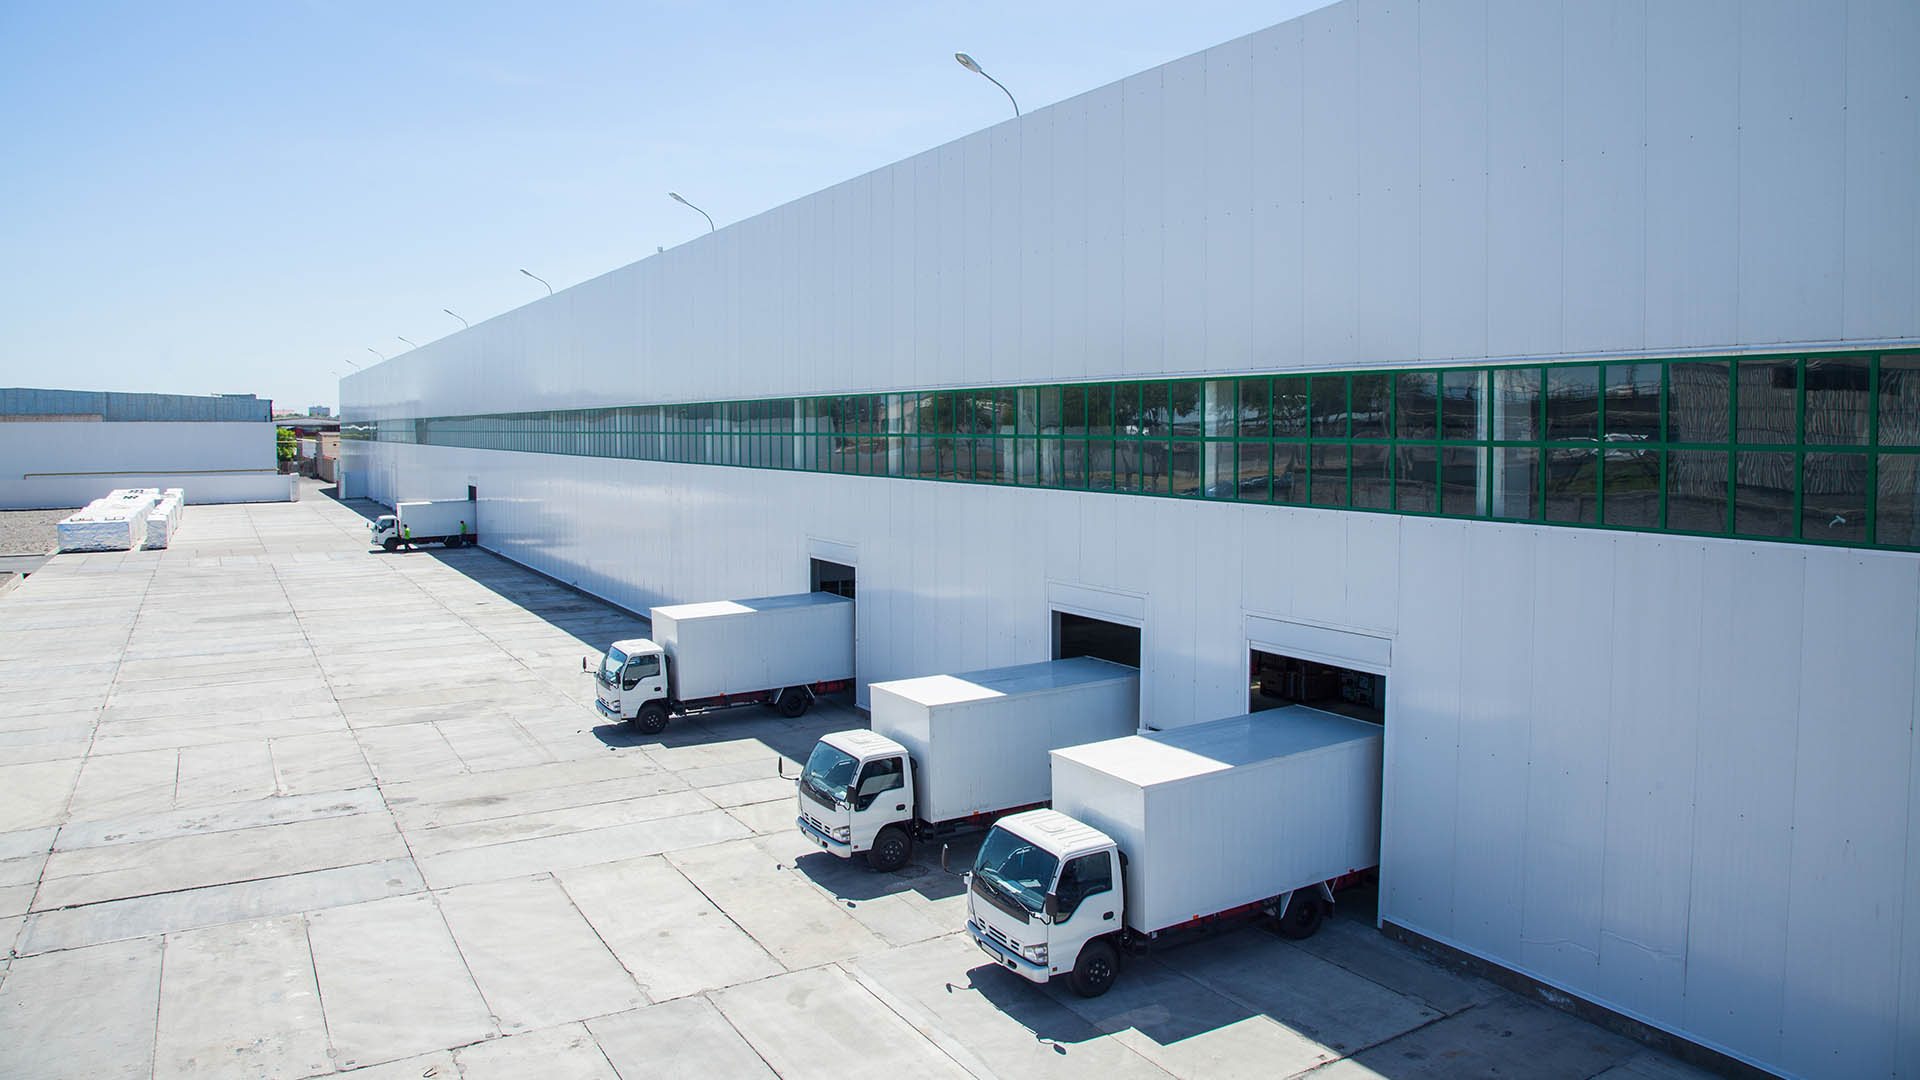 Centuria Industrial REIT (ASX:CIP) portfolio increases 30% with Telstra Data Centre purchase